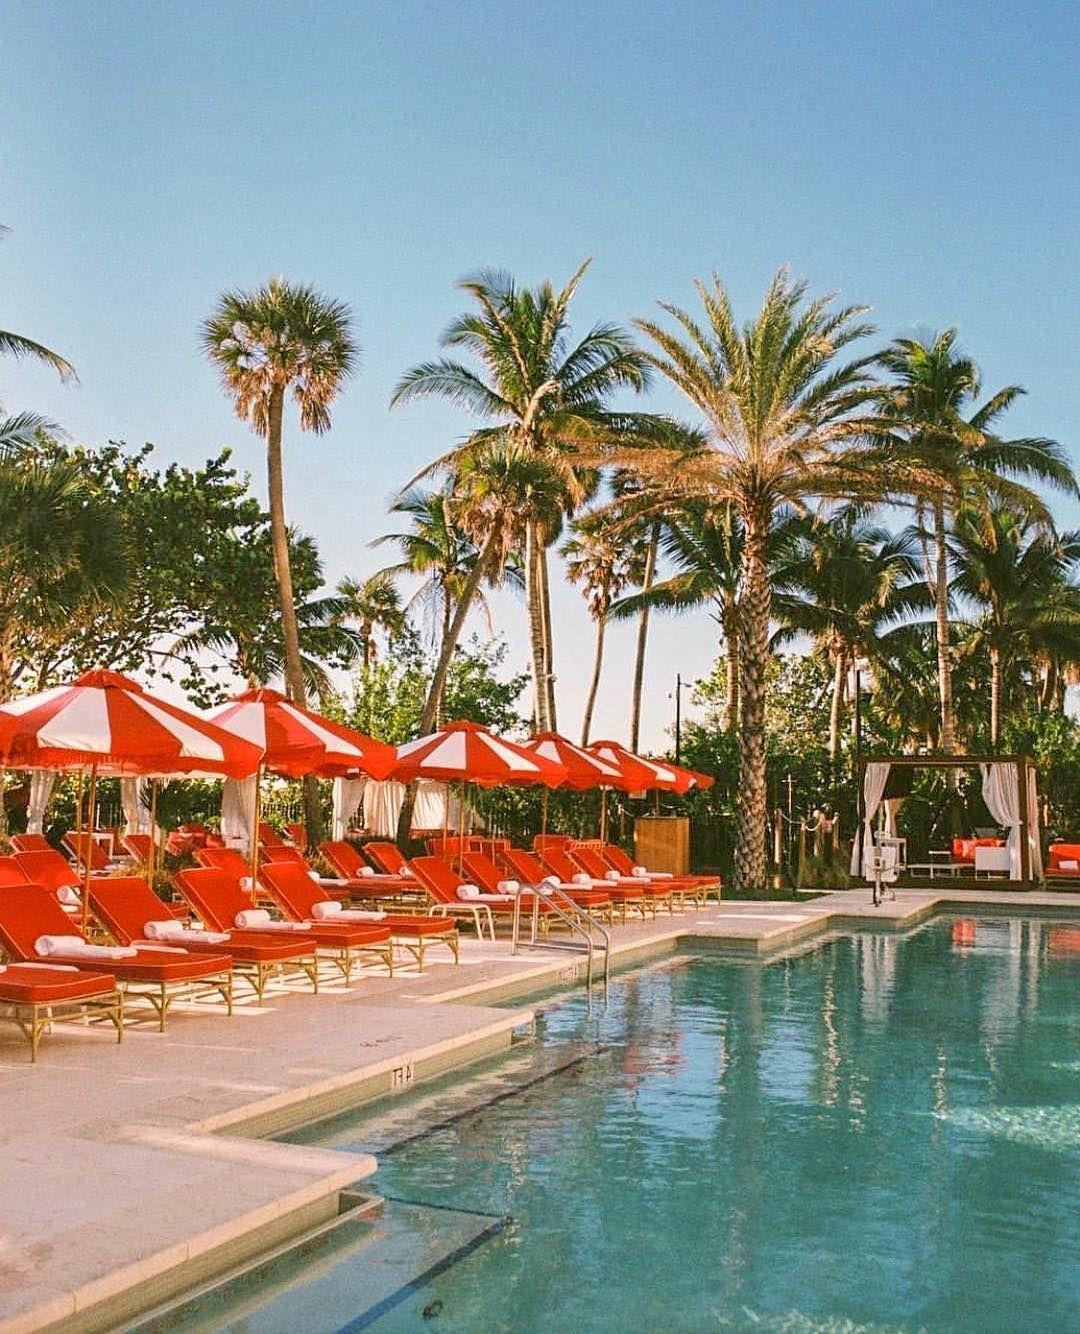 Faena Hotel Miami Beach Miami Beach Hotels Resorts Faena Hotel